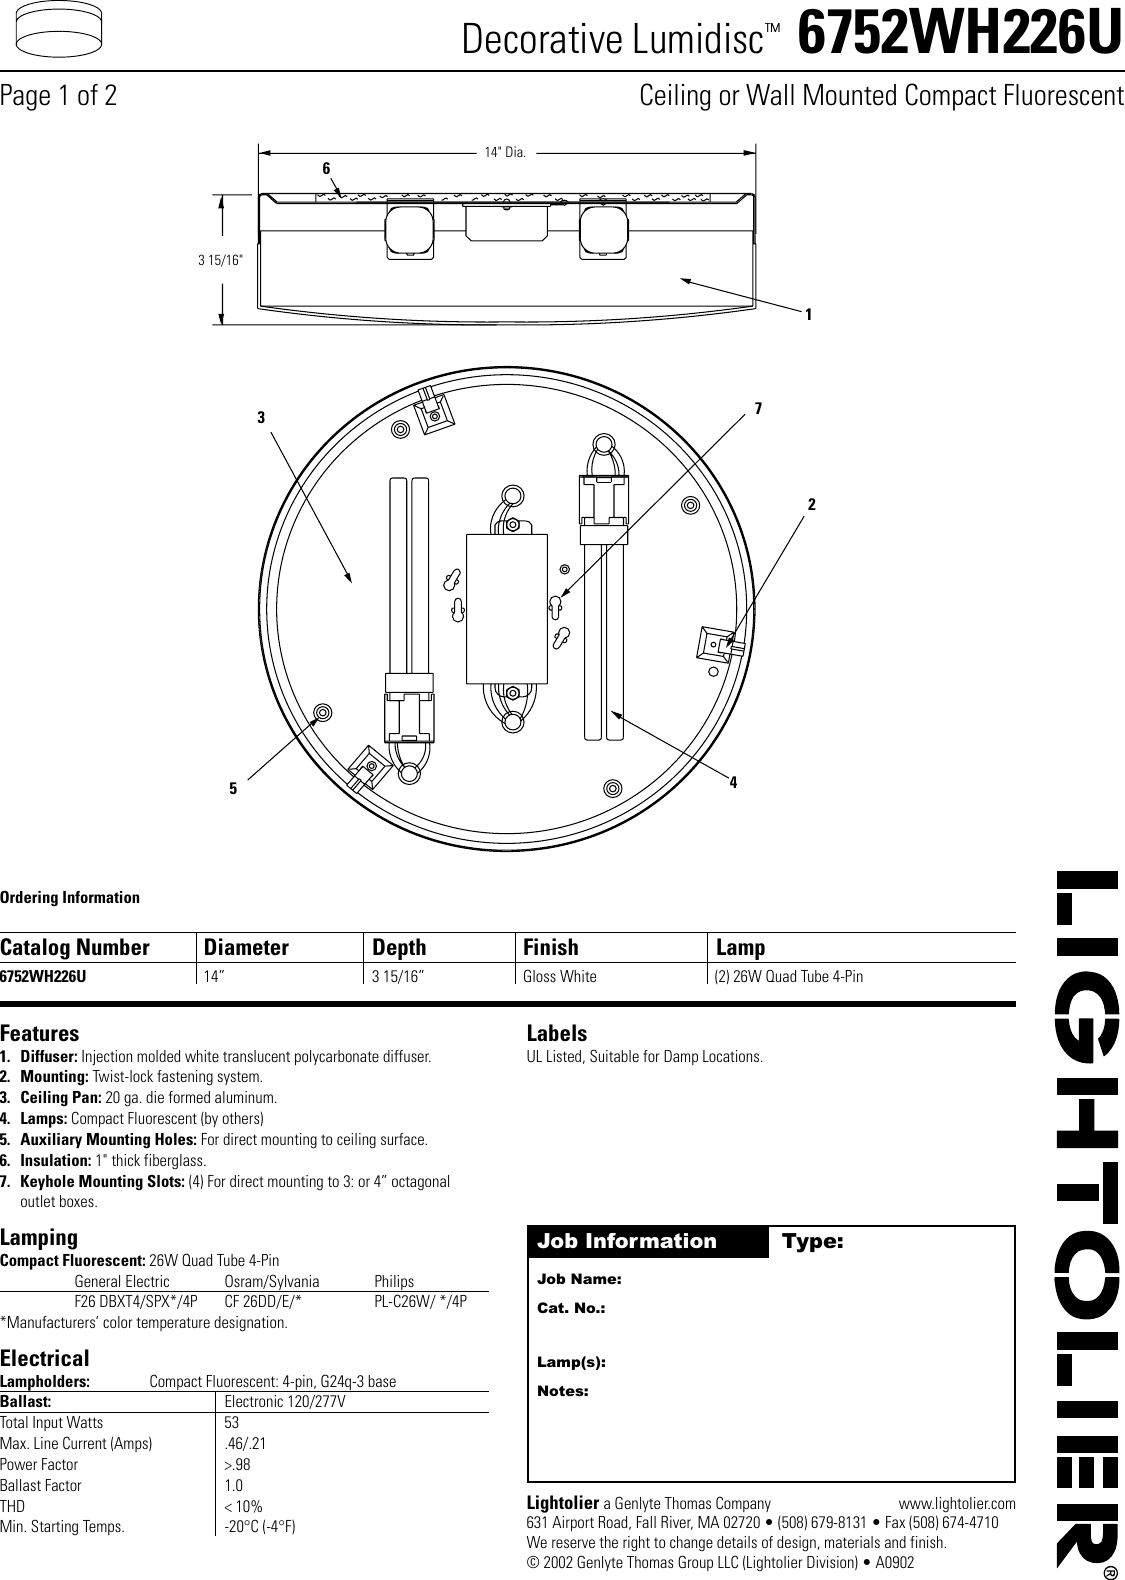 Lightolier Decorative Lumidisc 6752wh226u Users Manual 14 Watt Compact Fluorescent Electronic Ballast